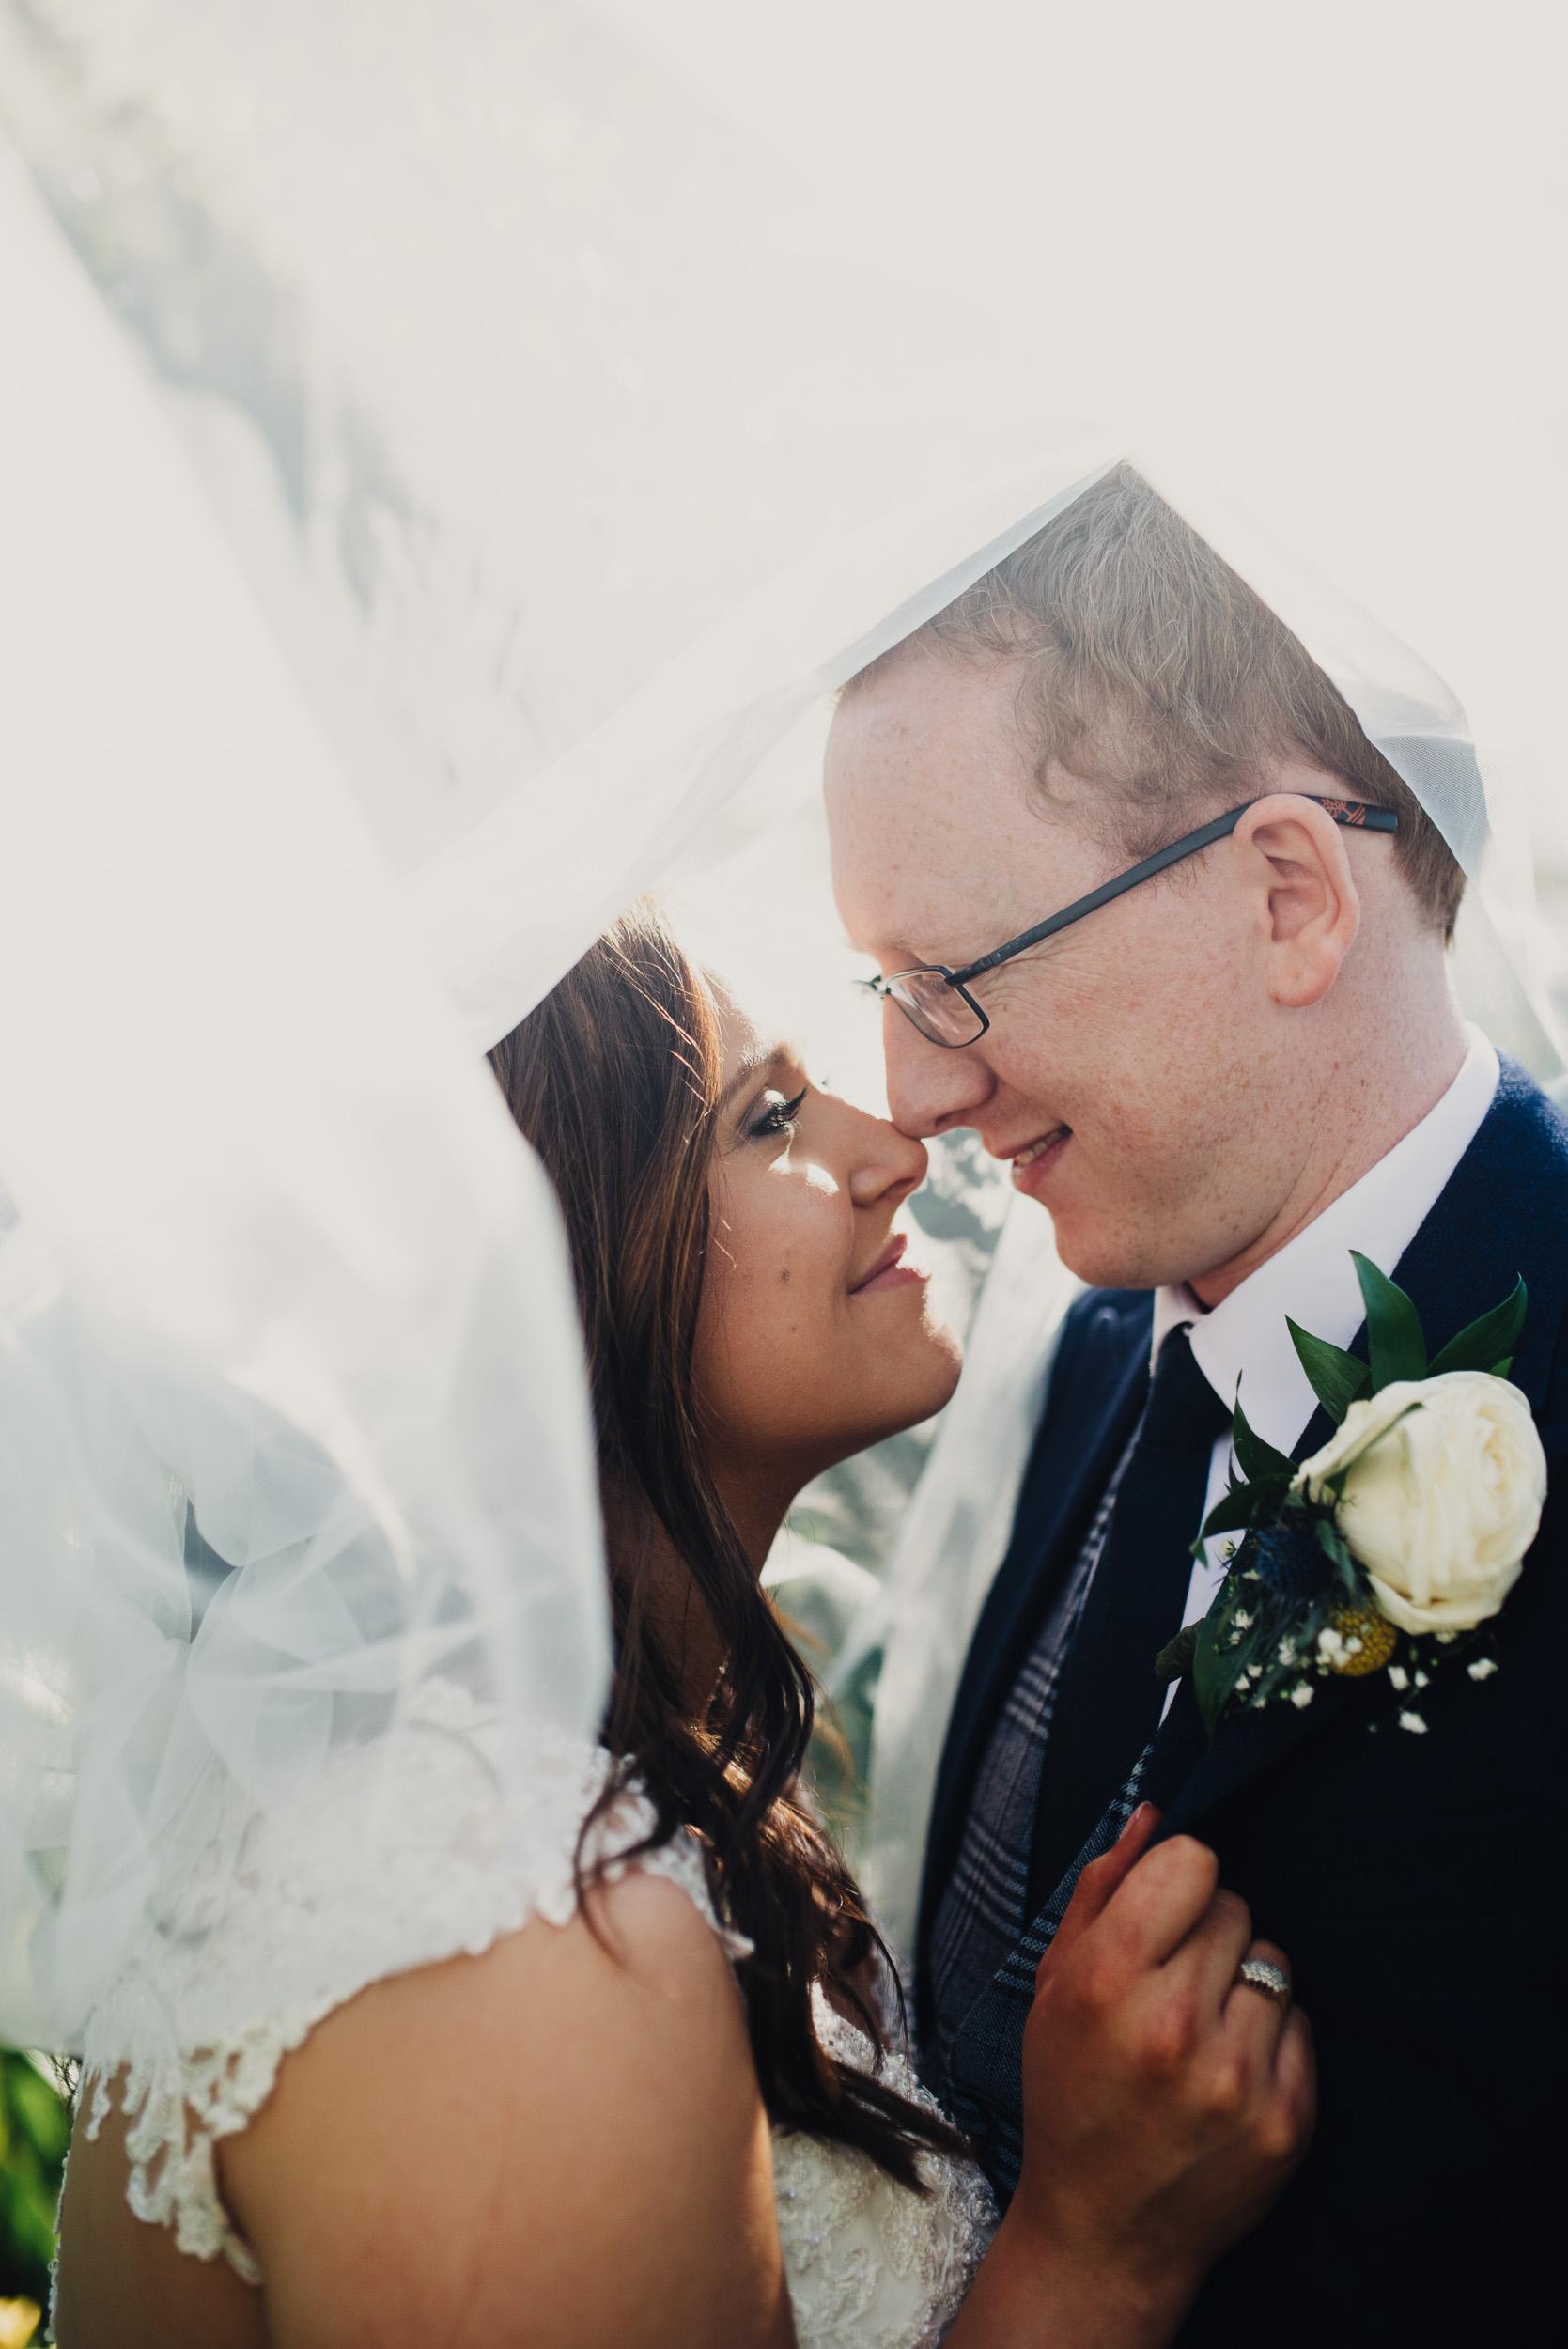 wedding photogaphy peter mackey 2018 beth-12.jpg